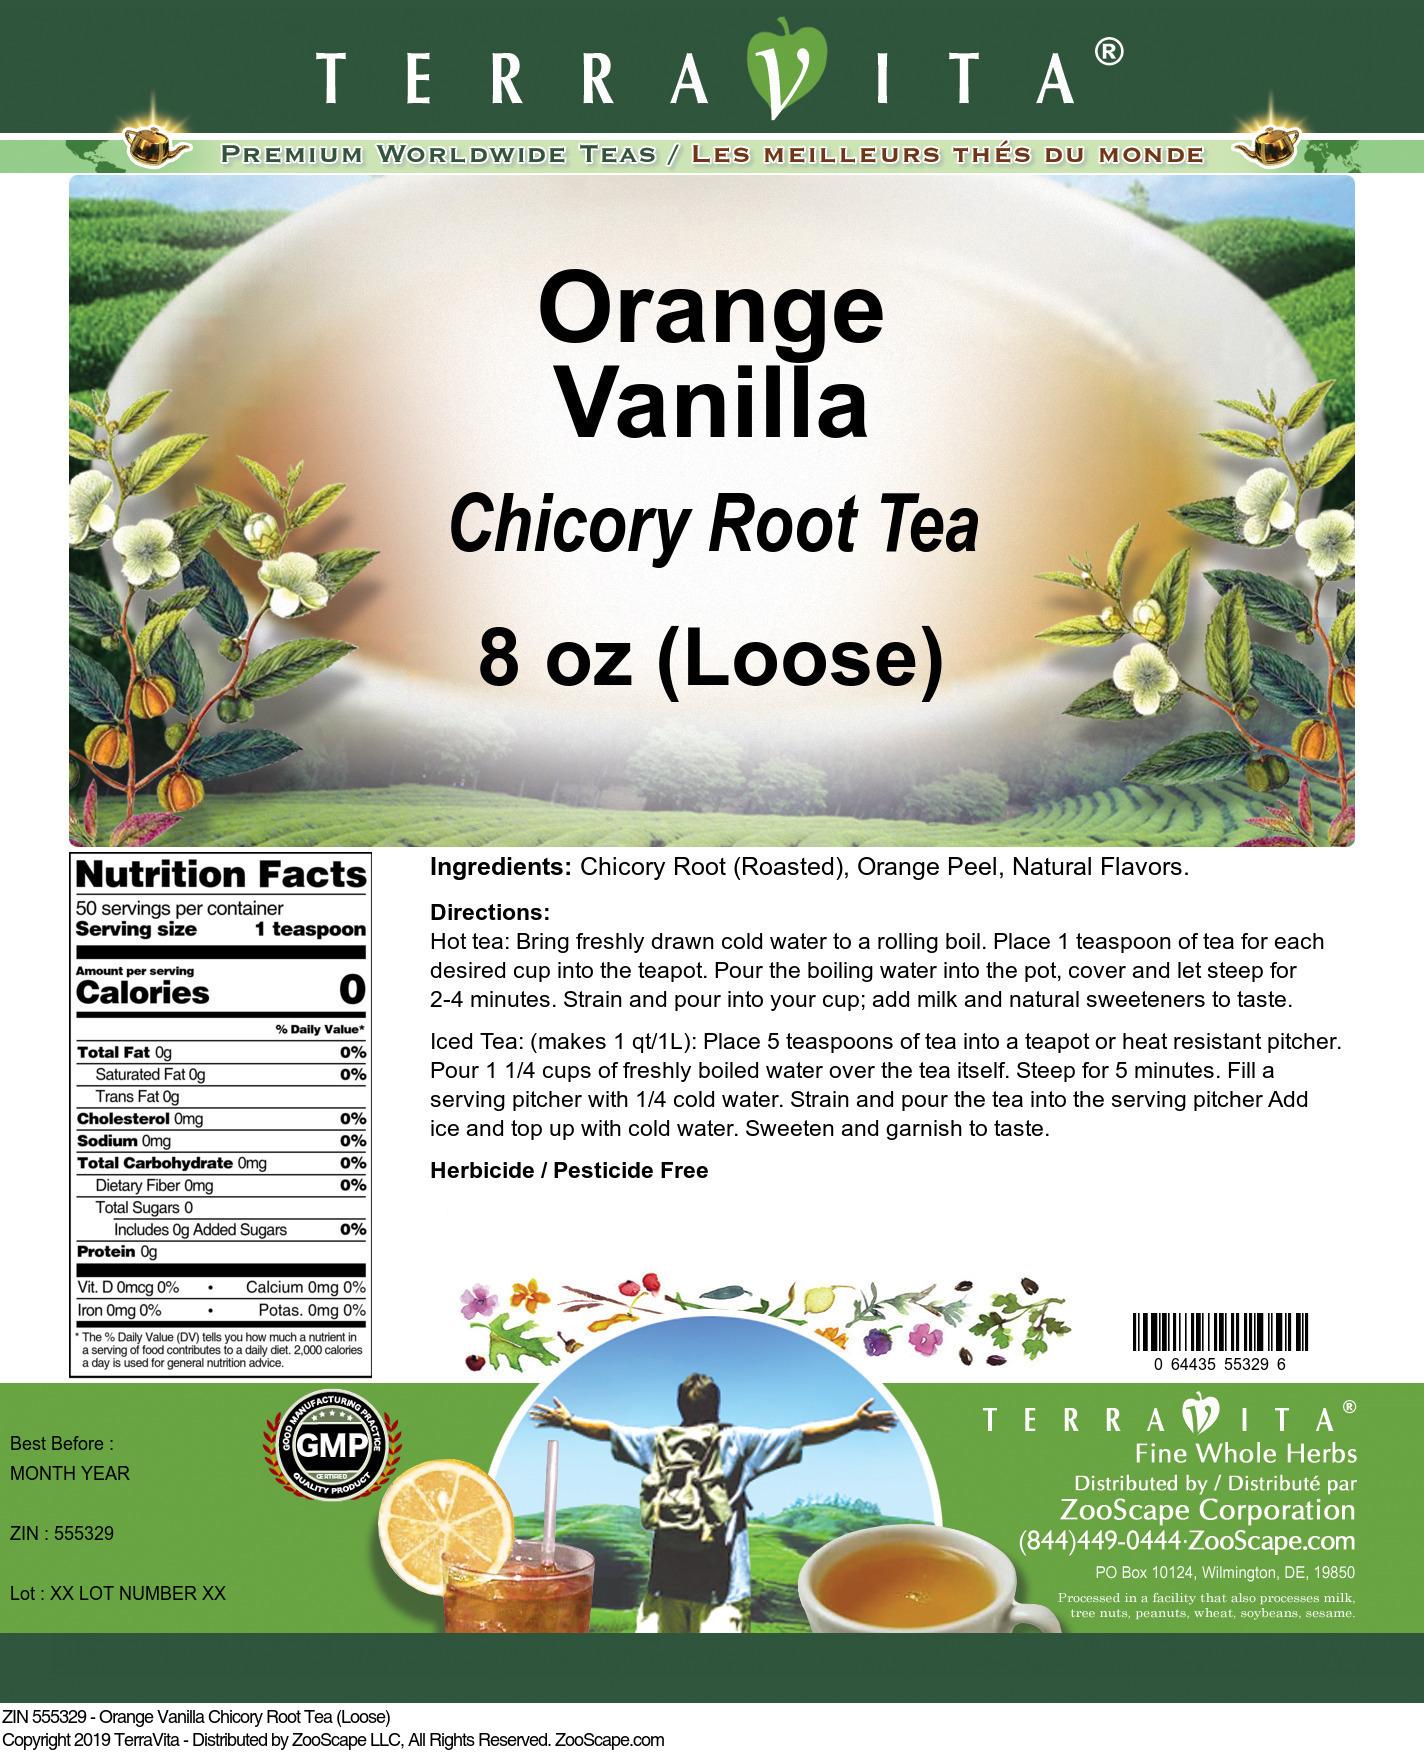 Orange Vanilla Chicory Root Tea (Loose)